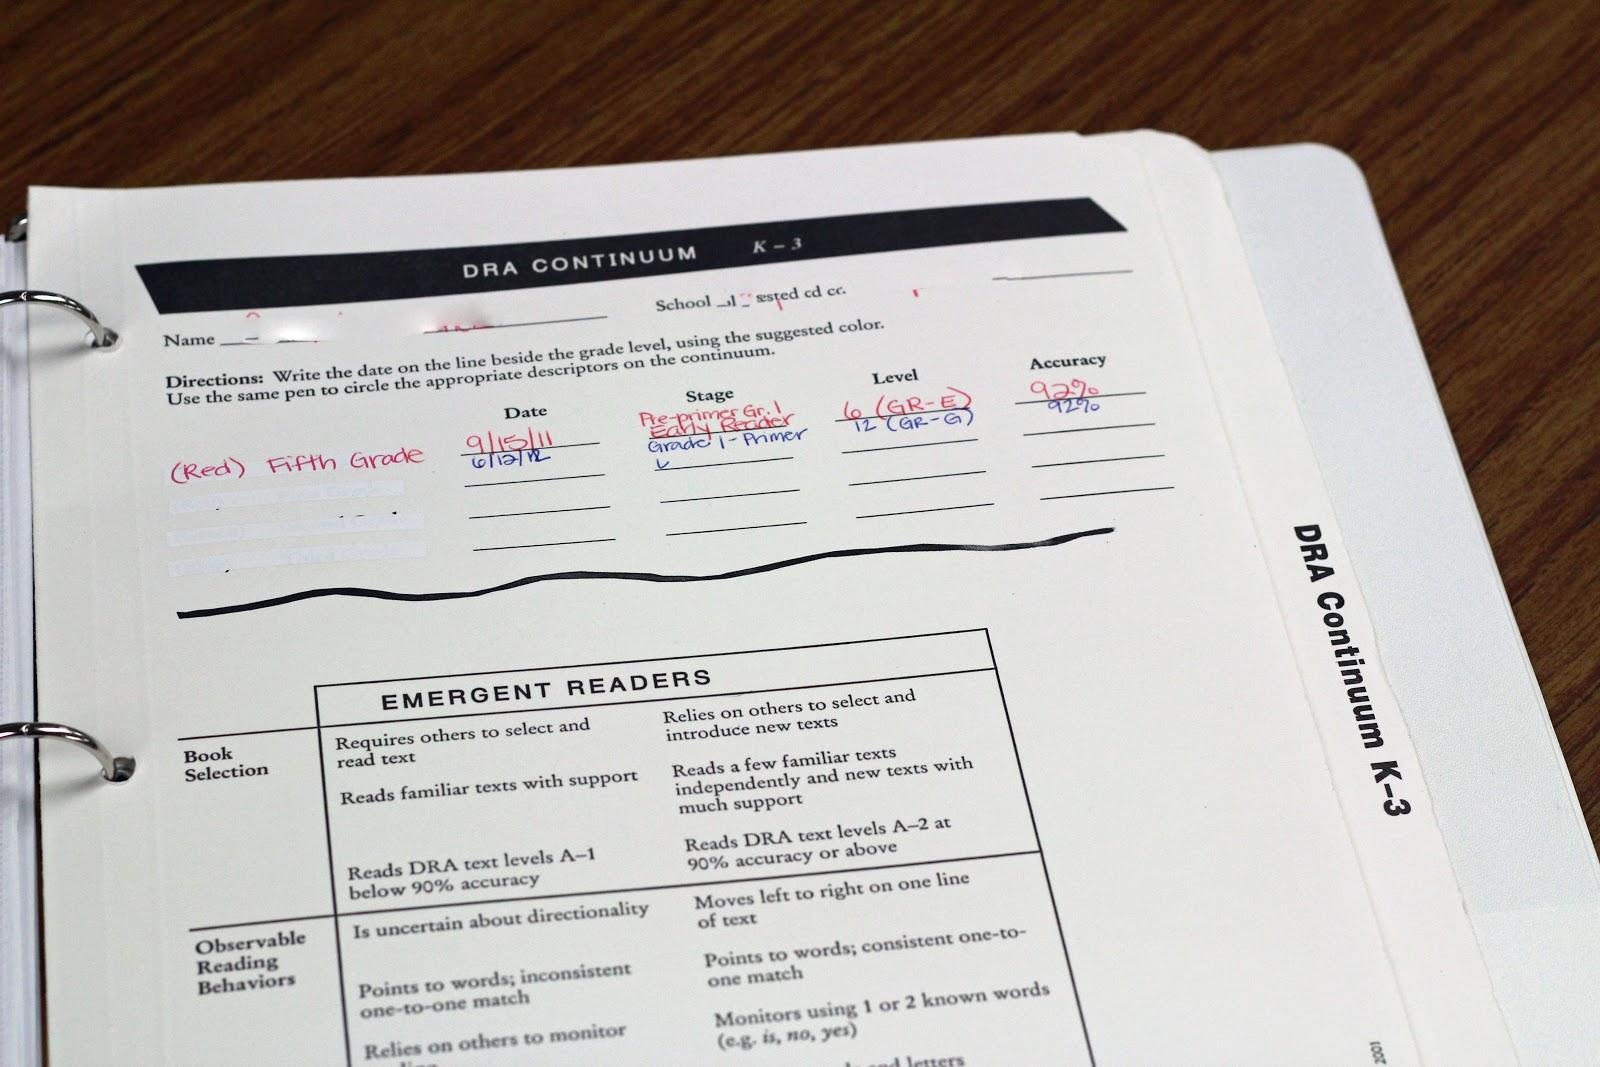 sample summary essay muet band 5